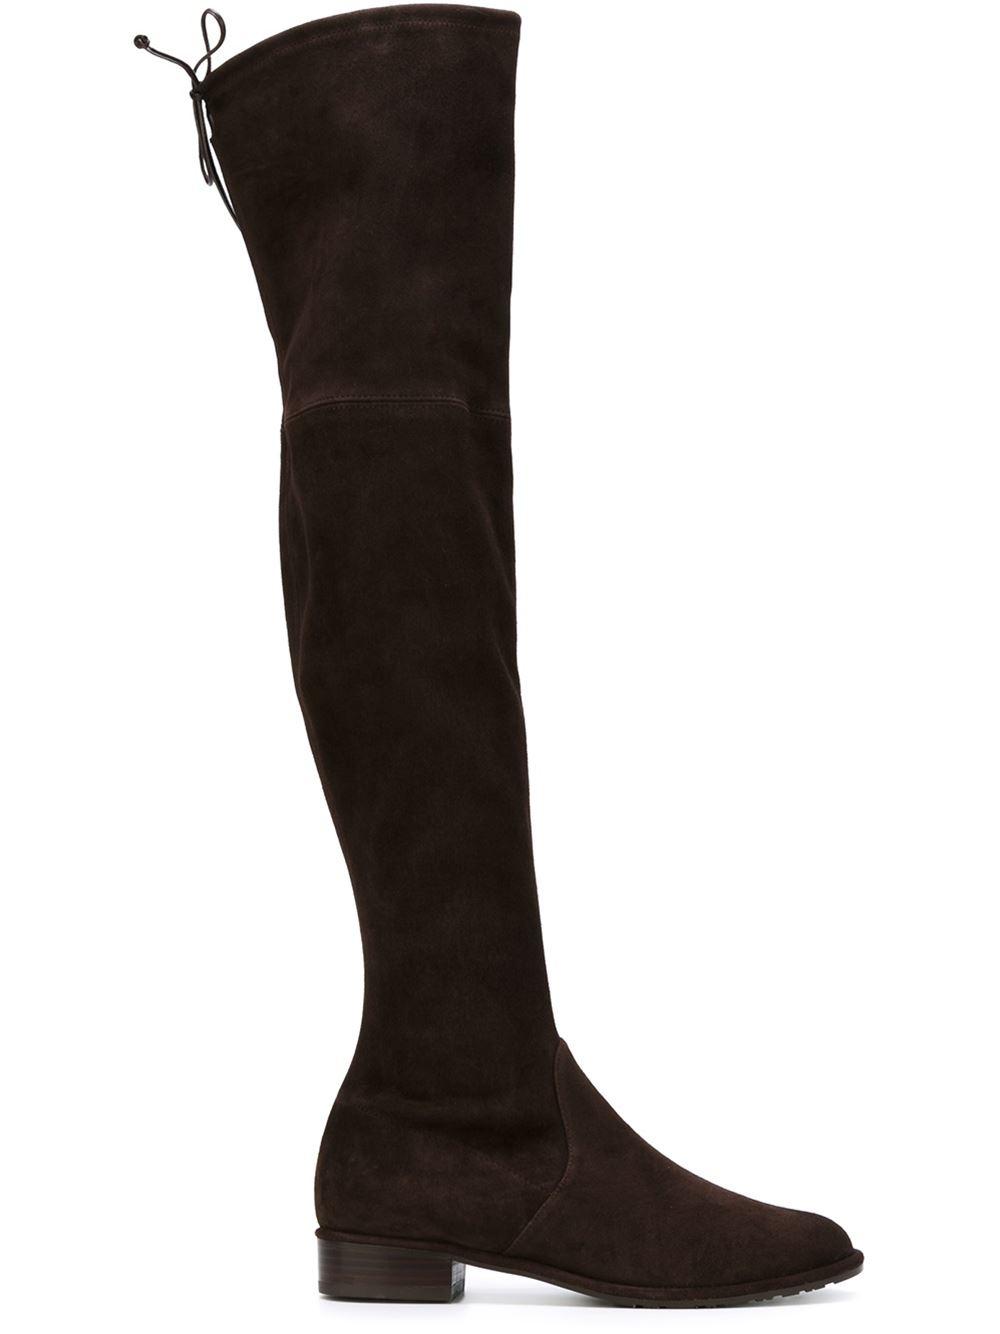 Stuart Weitzman Lowland Boots In Brown Lyst